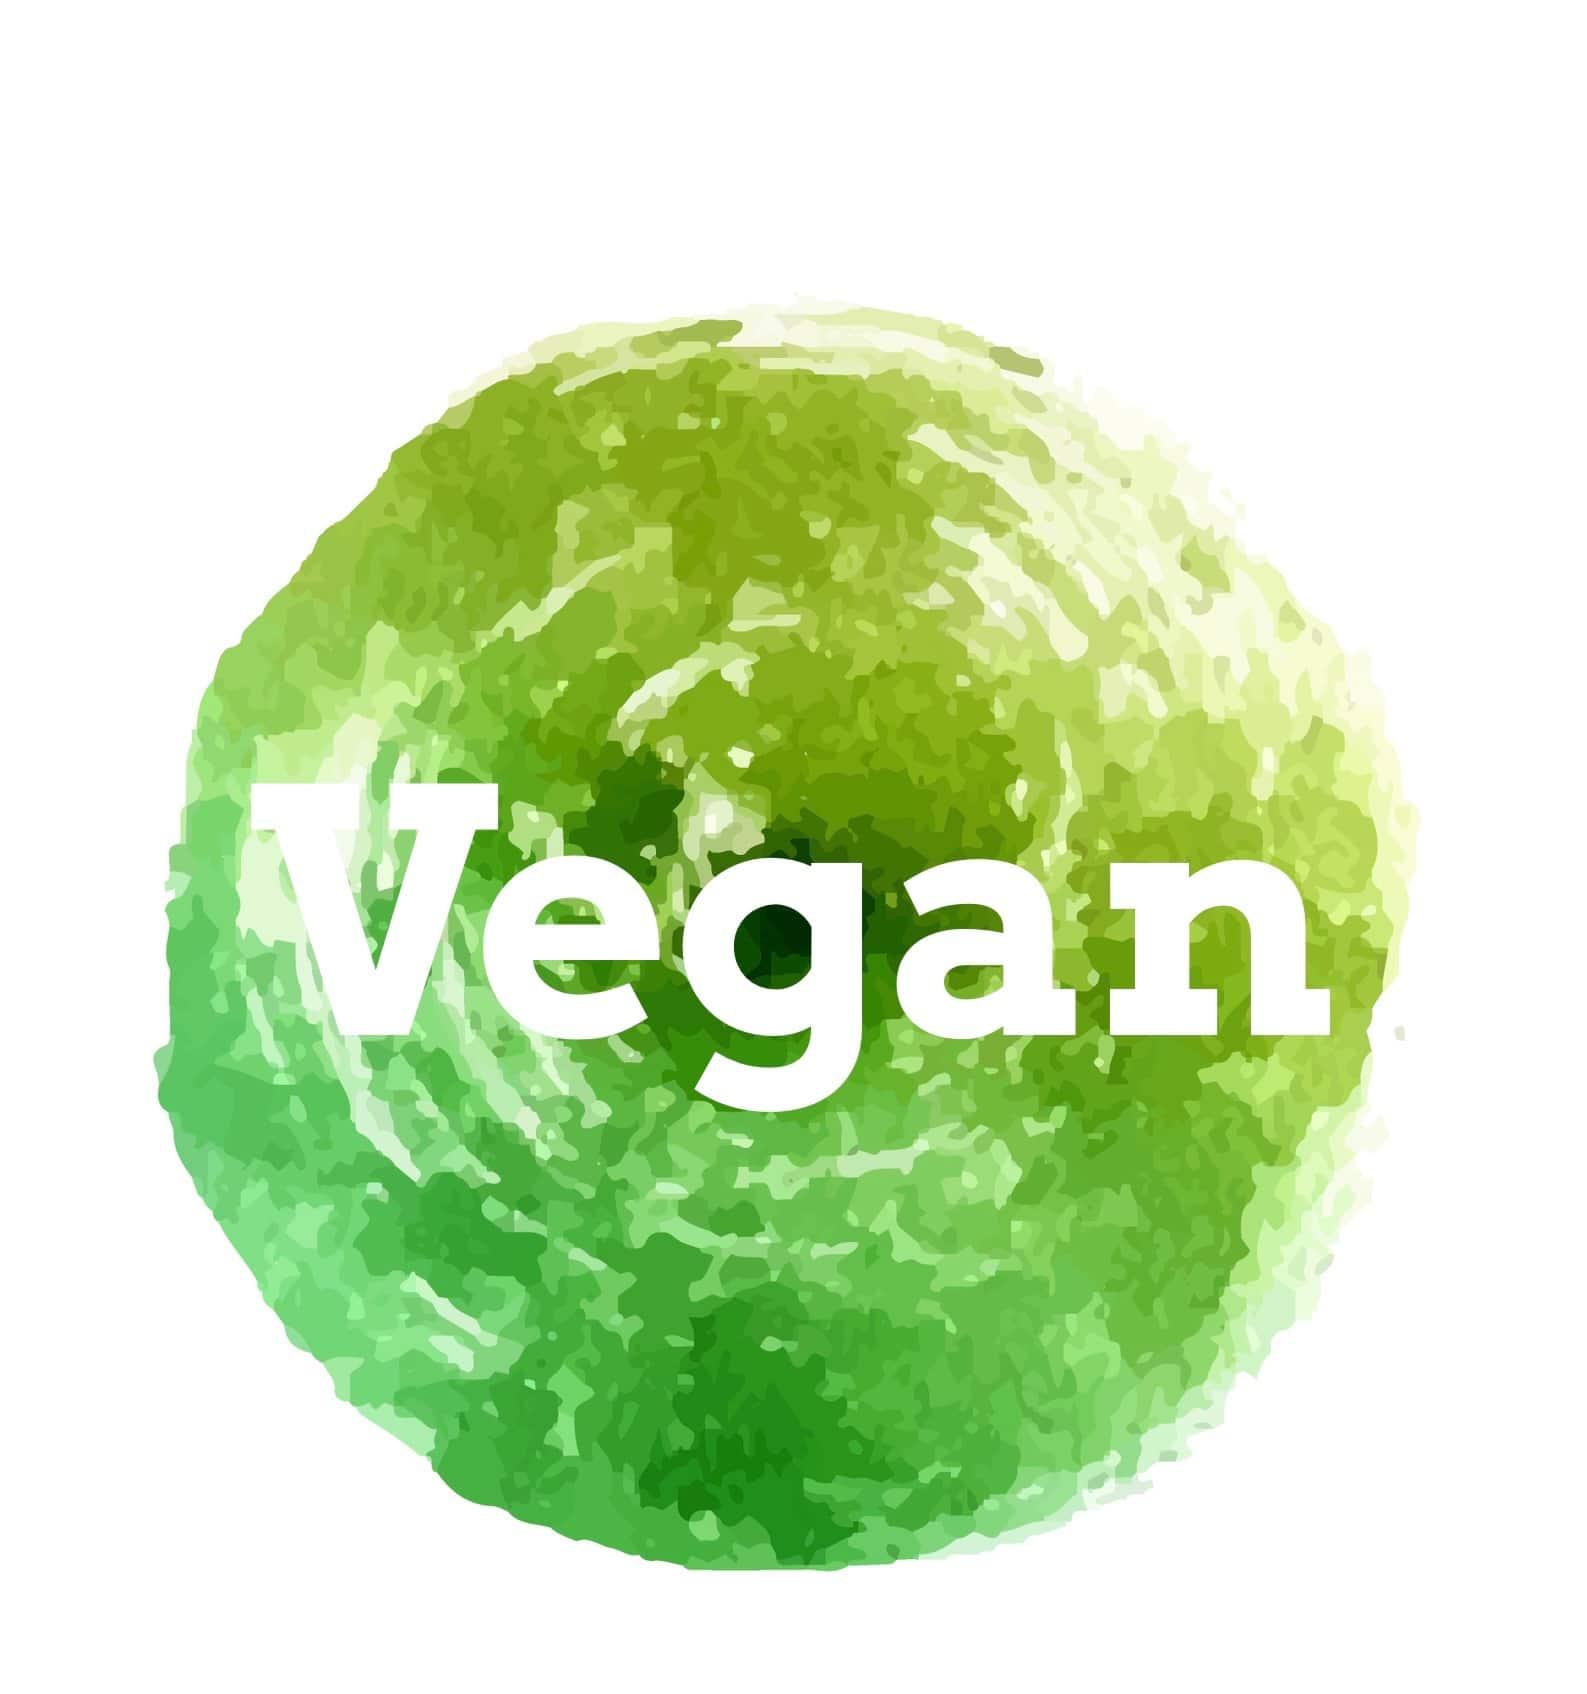 vegan product